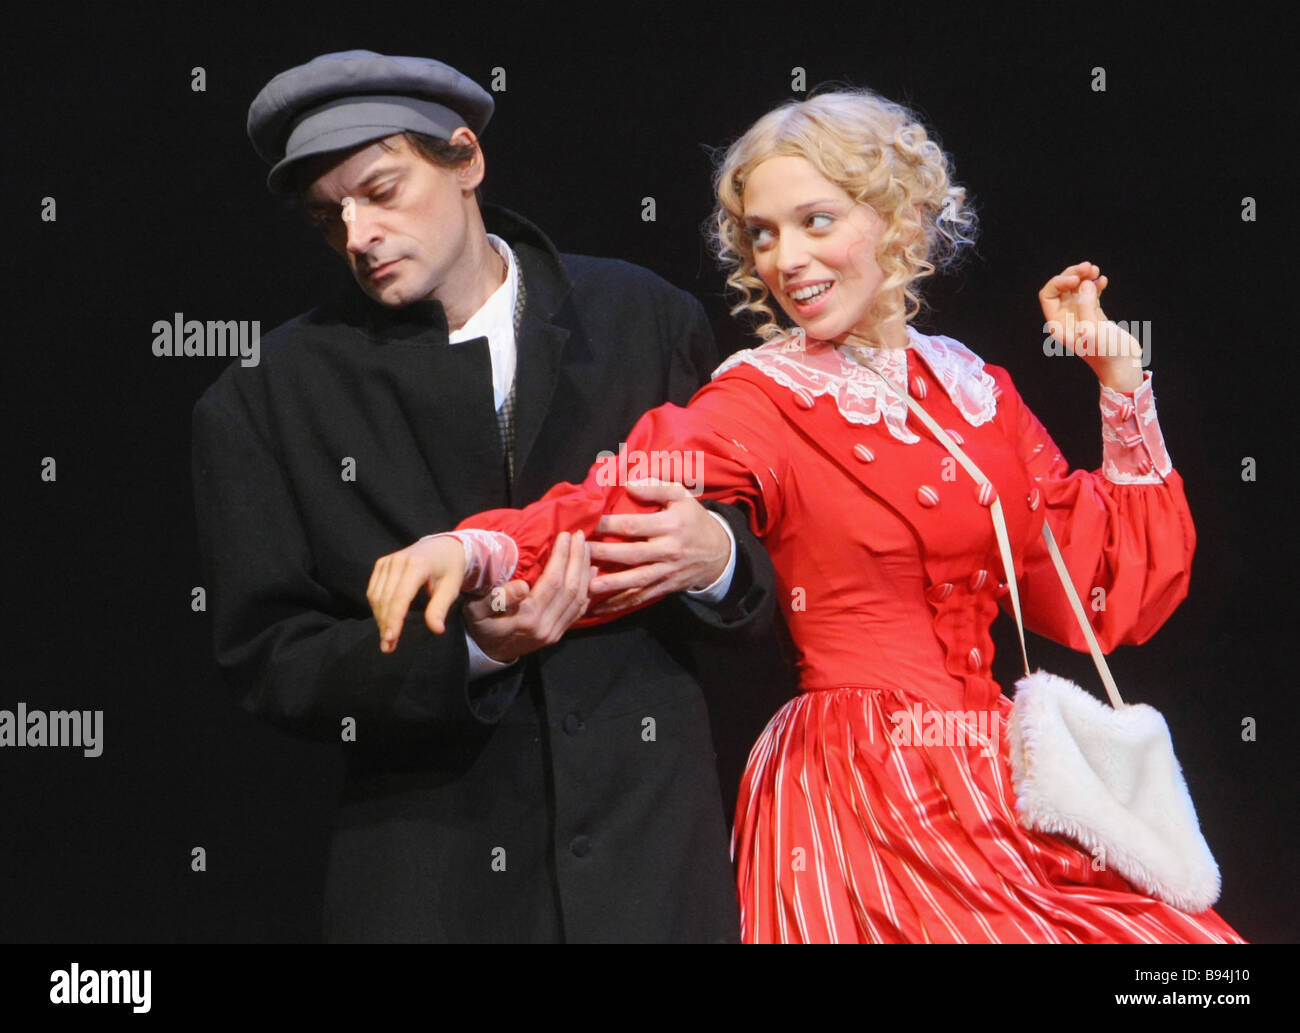 Yevgeny Redko as Vissarion Belinsky and Nelli Uvarova as Natalie Beer in the showcase of Tom Stoppard s The Coast - Stock Image